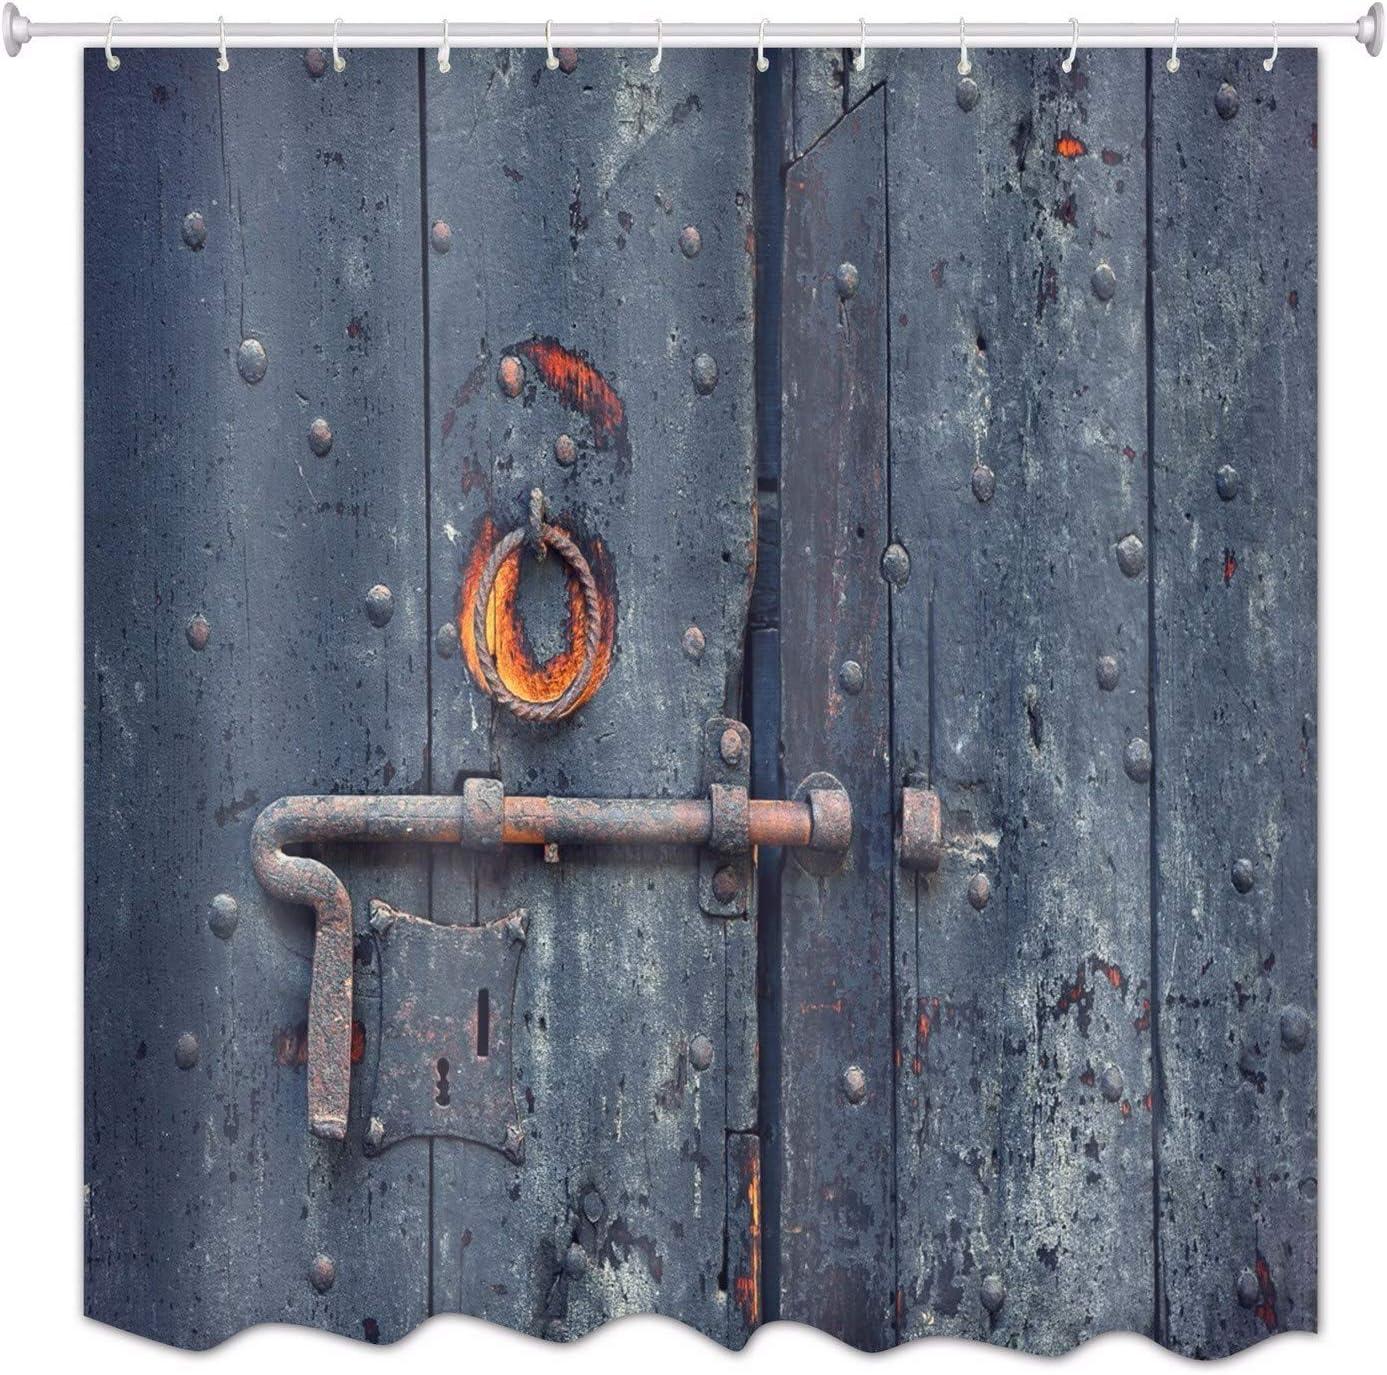 A.Monamour Azul Profundo Puerta De Madera Pintada Vintage Tablones De Tela De Poliéster Impermeable Barn Cortinas De Ducha De Tela Poliester Antimoho De Madera para Bañeras De Baño 180x200 cm